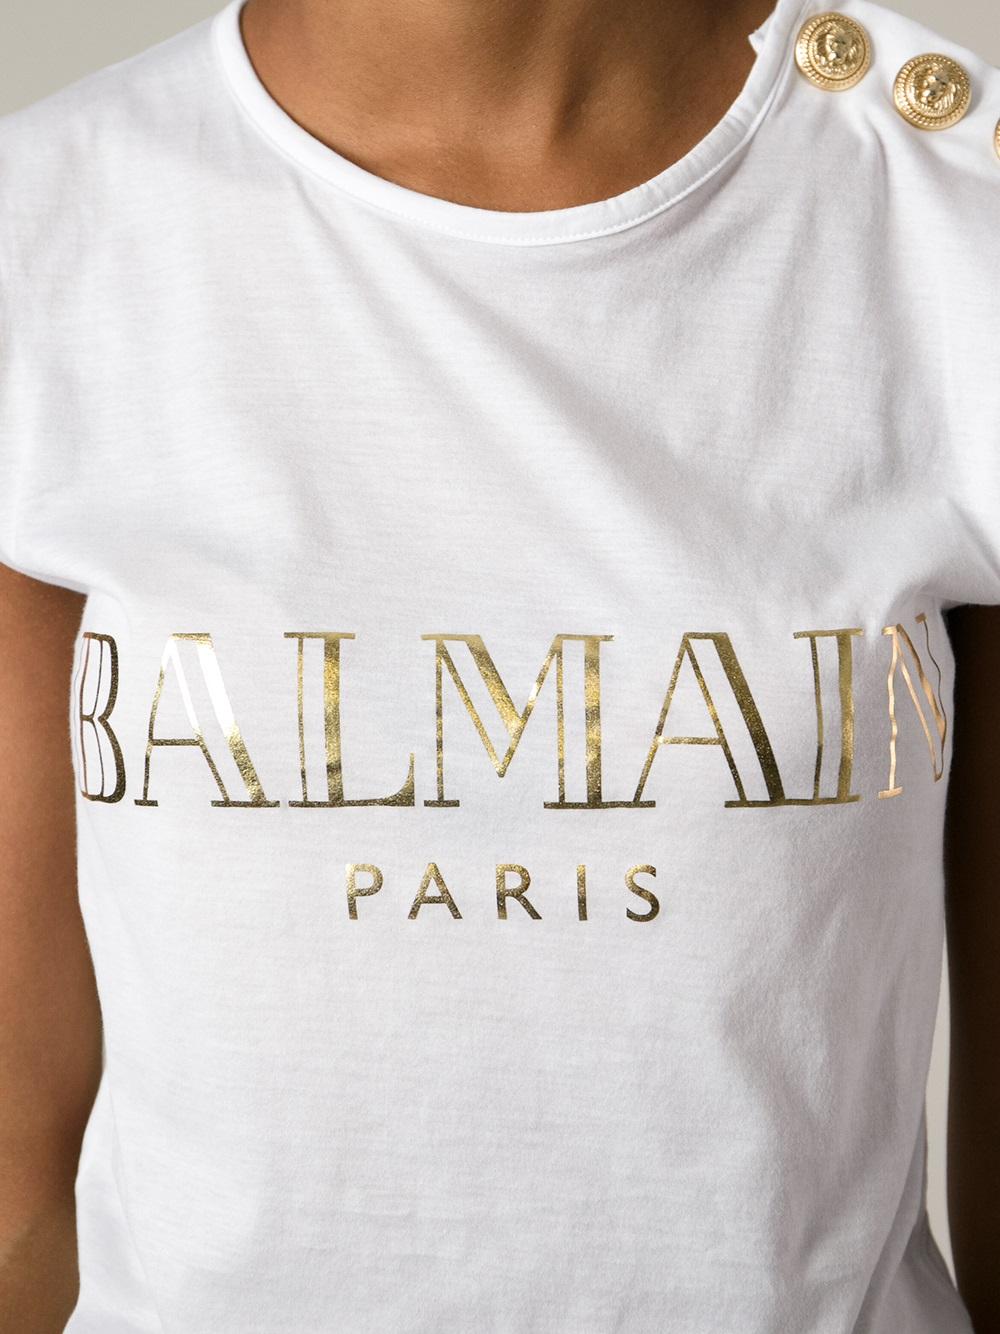 Balmain Brand Print T Shirt In White Lyst